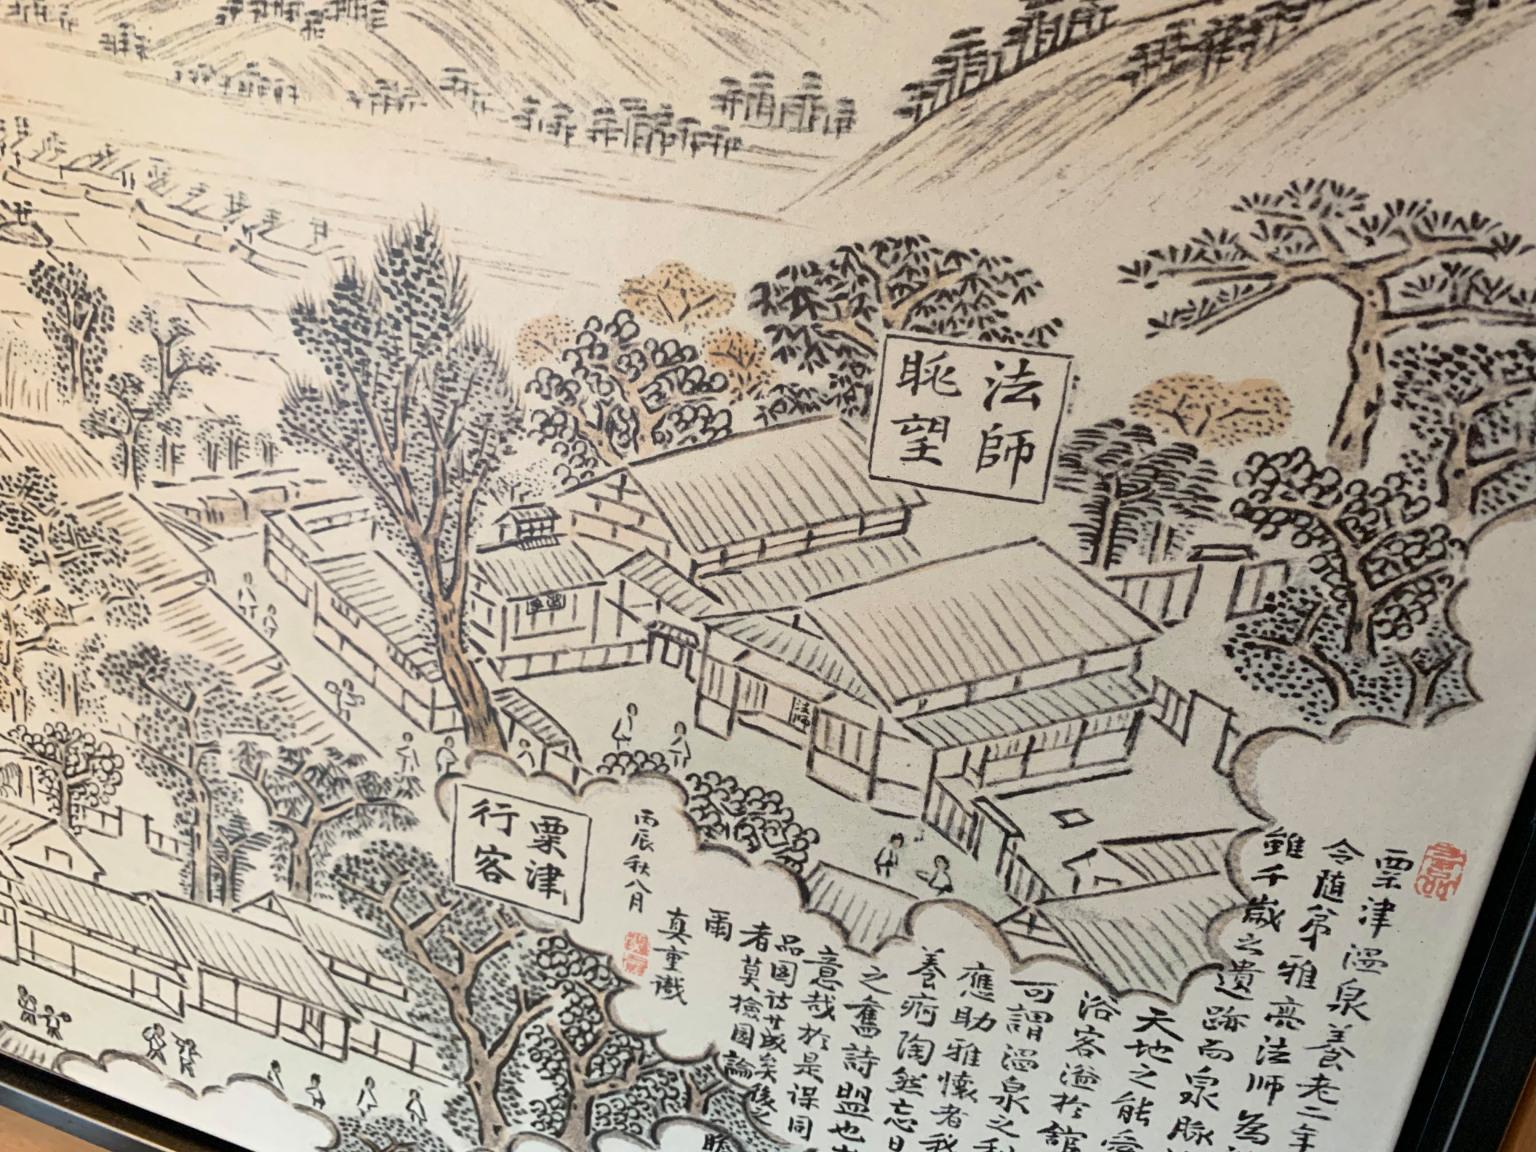 Houshi-Ryokan-onsen-hotel-oldest-in-world-Japan-business-travel-Hoshi-accommodation-stay-photos-reviews-Ishikawa-21.jpg